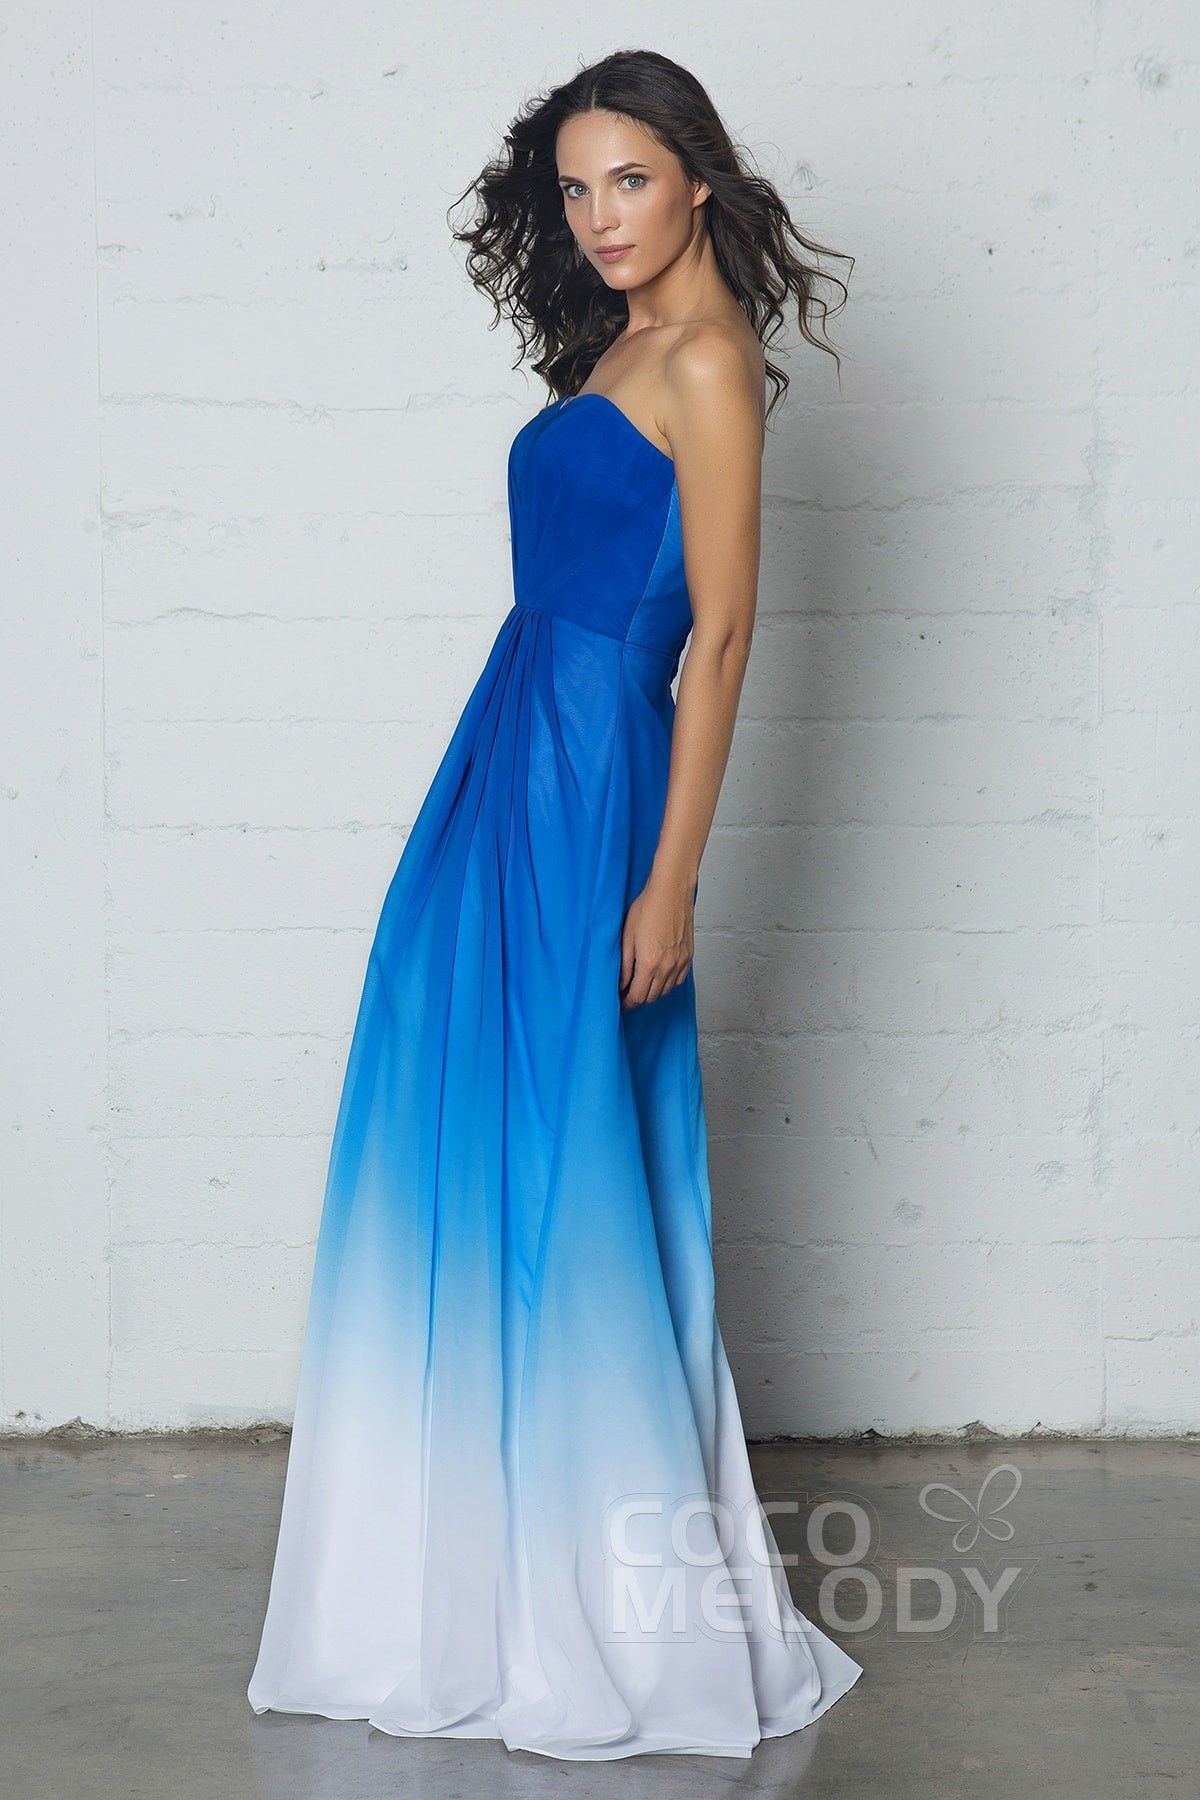 Royal blue wedding dresses plus size  Charming Sweetheart Natural Floor Length Ombre Chiffon Sleeveless